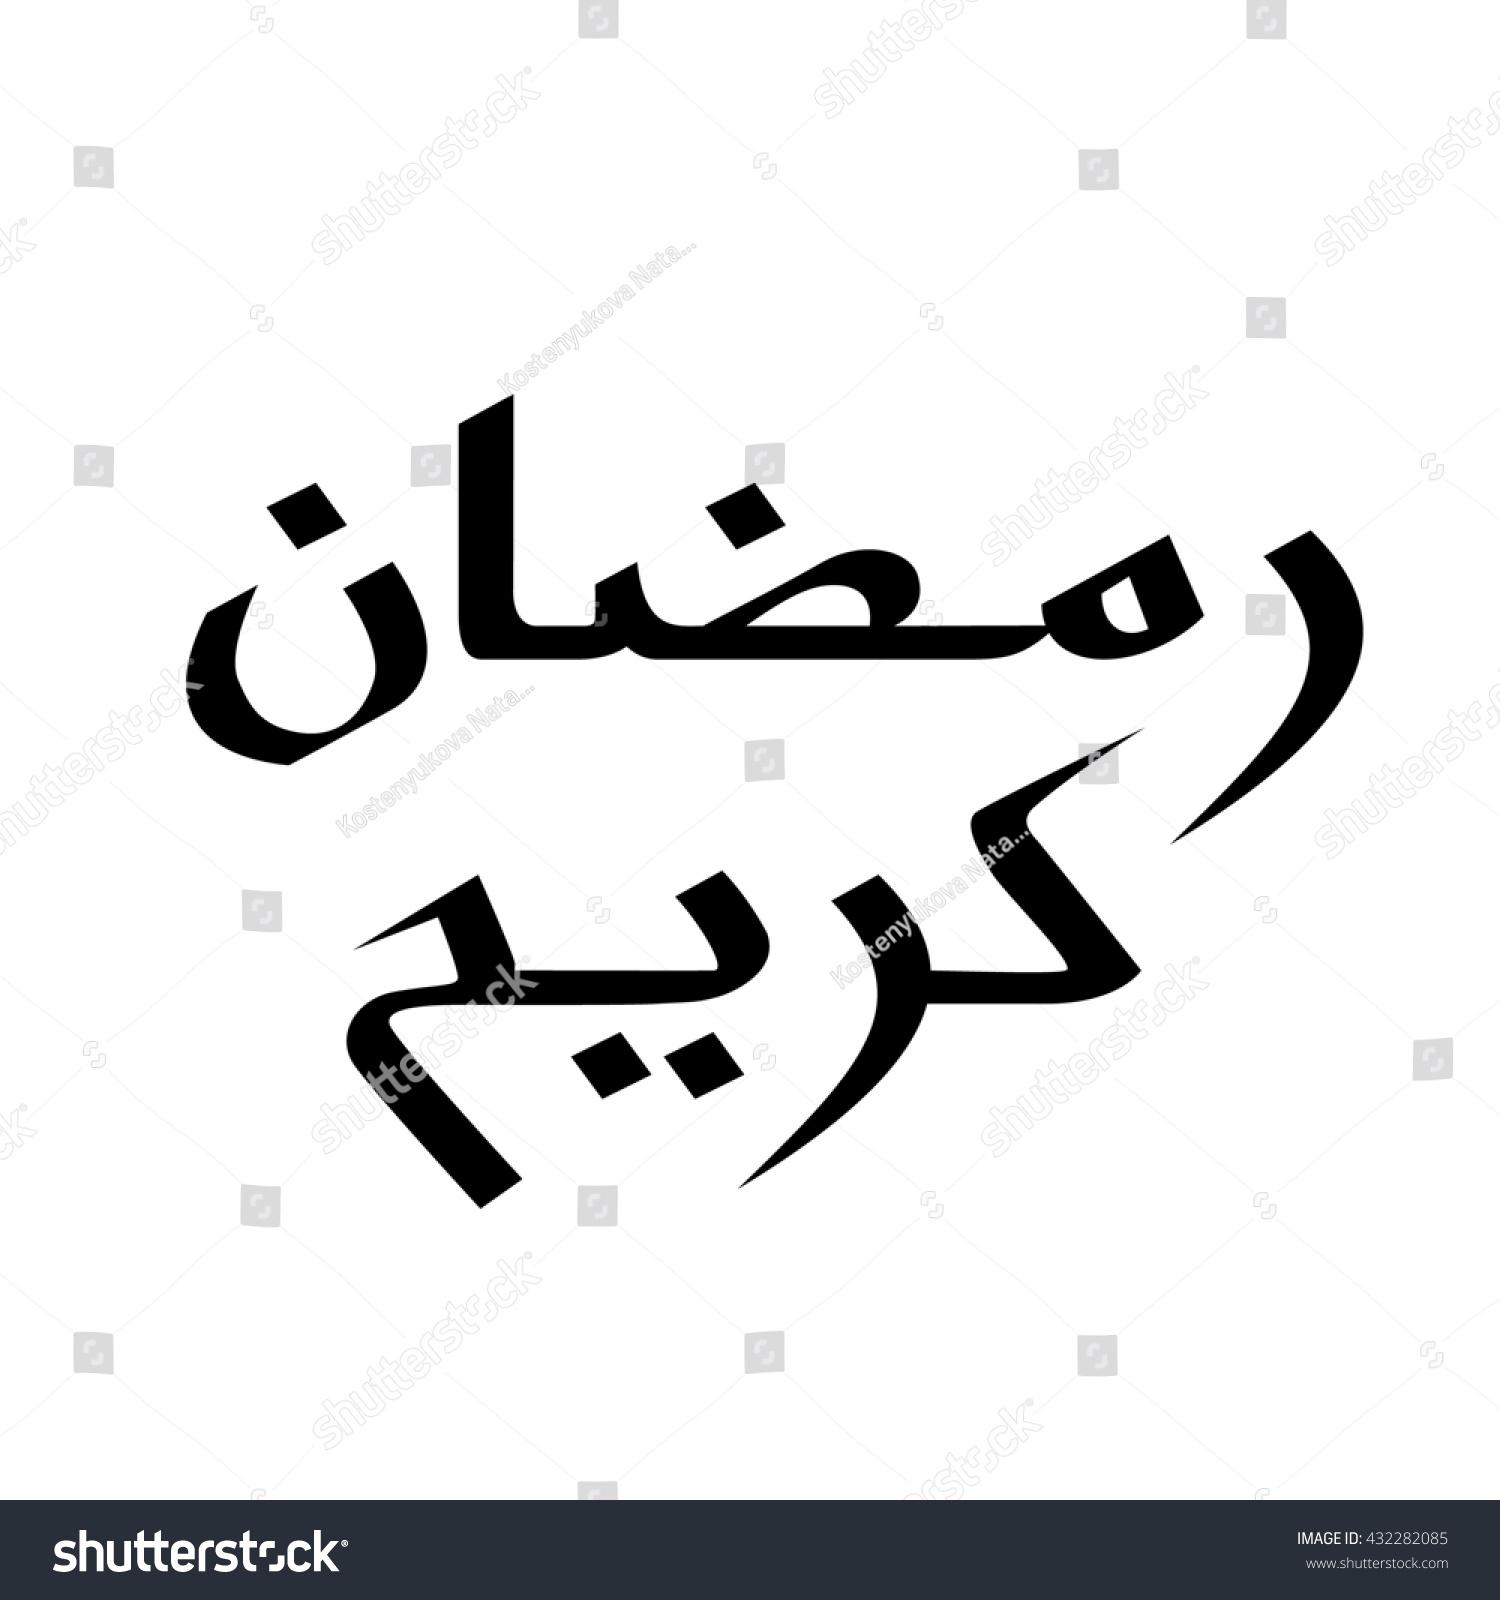 Calligraphy arabic text ramadan kareem ramadan stock illustration calligraphy of arabic text of ramadan kareem ramadan kareem means ramadan is generous buycottarizona